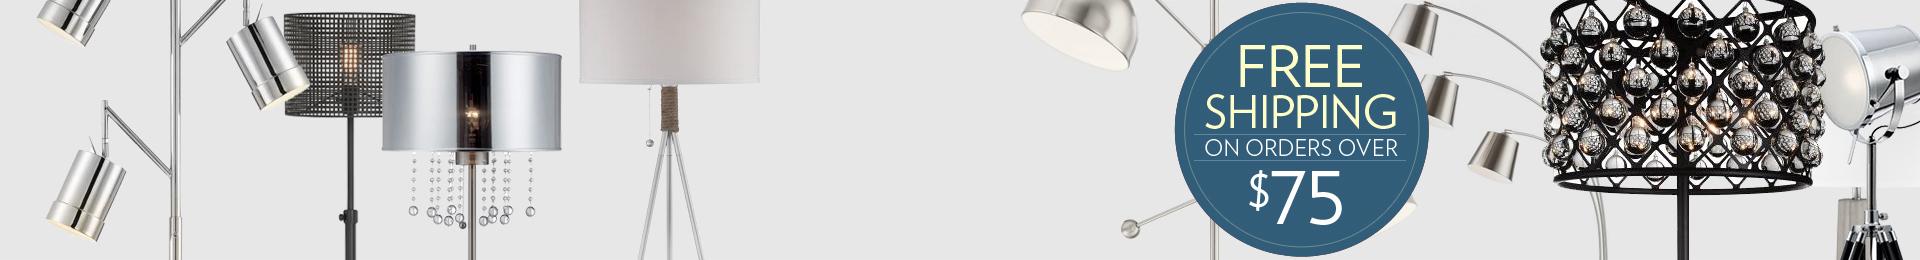 top-banner-for-categories-lamps.jpg